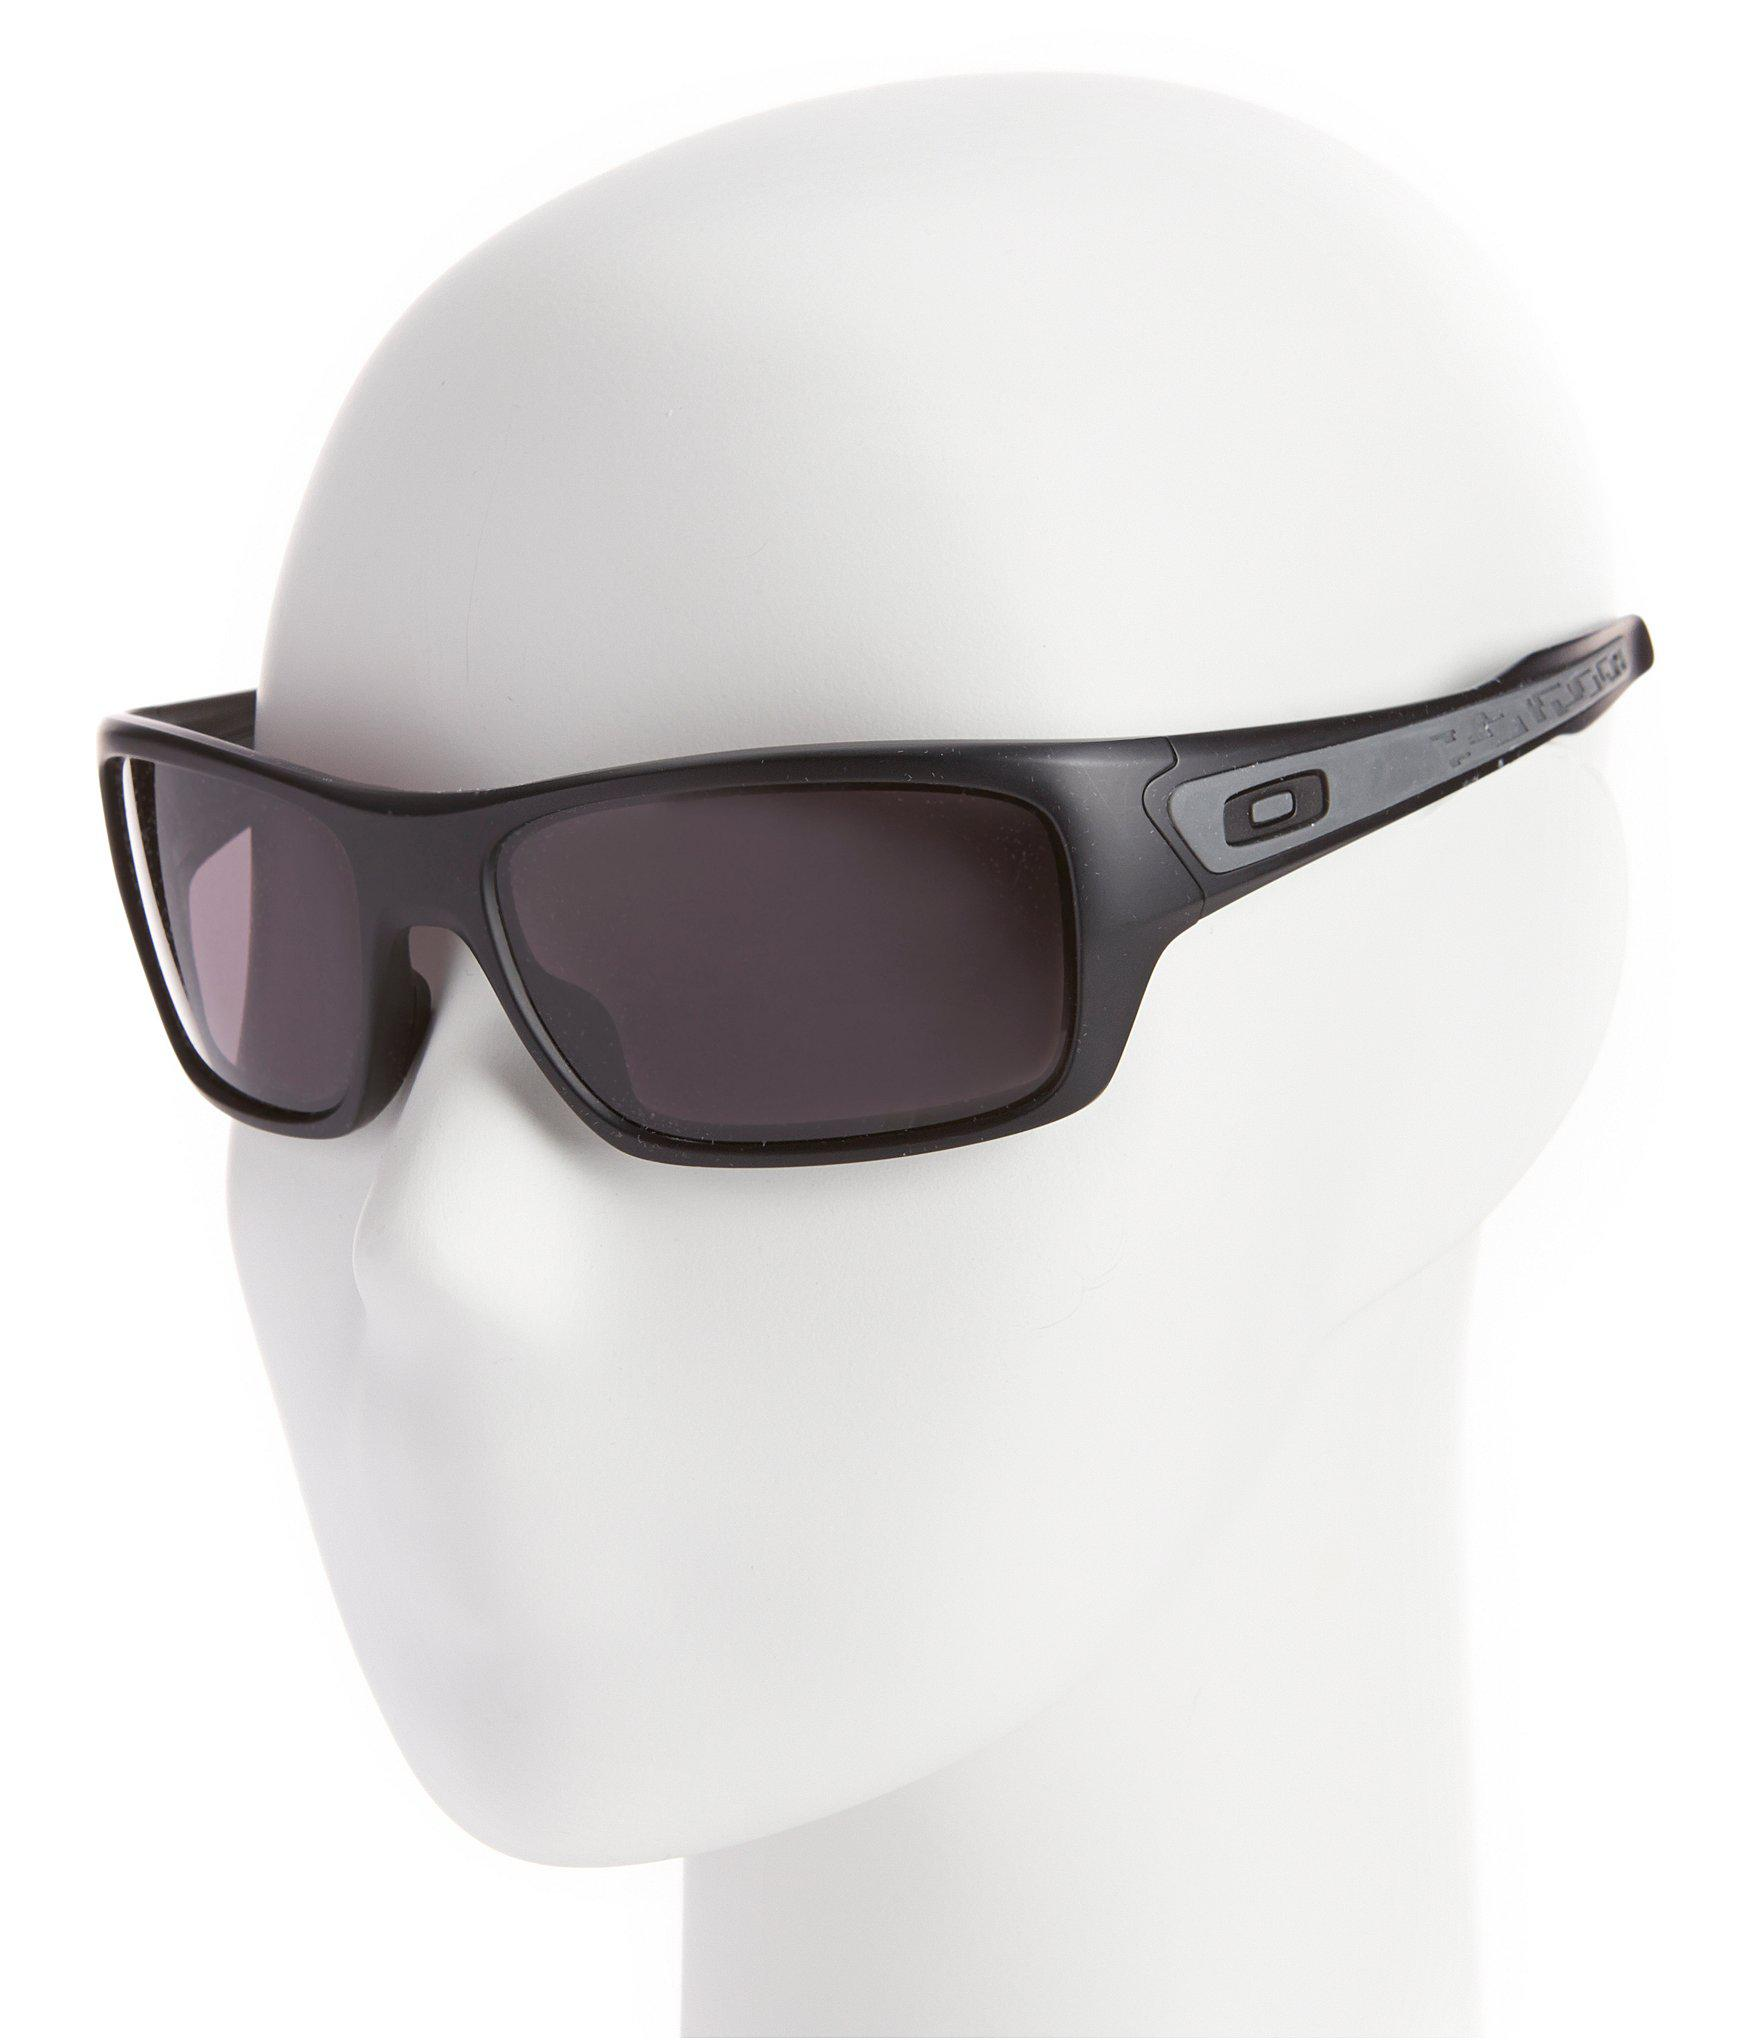 69744f72836 Oakley - Turbine Matte Black Rectangle Sunglasses for Men - Lyst. View  fullscreen